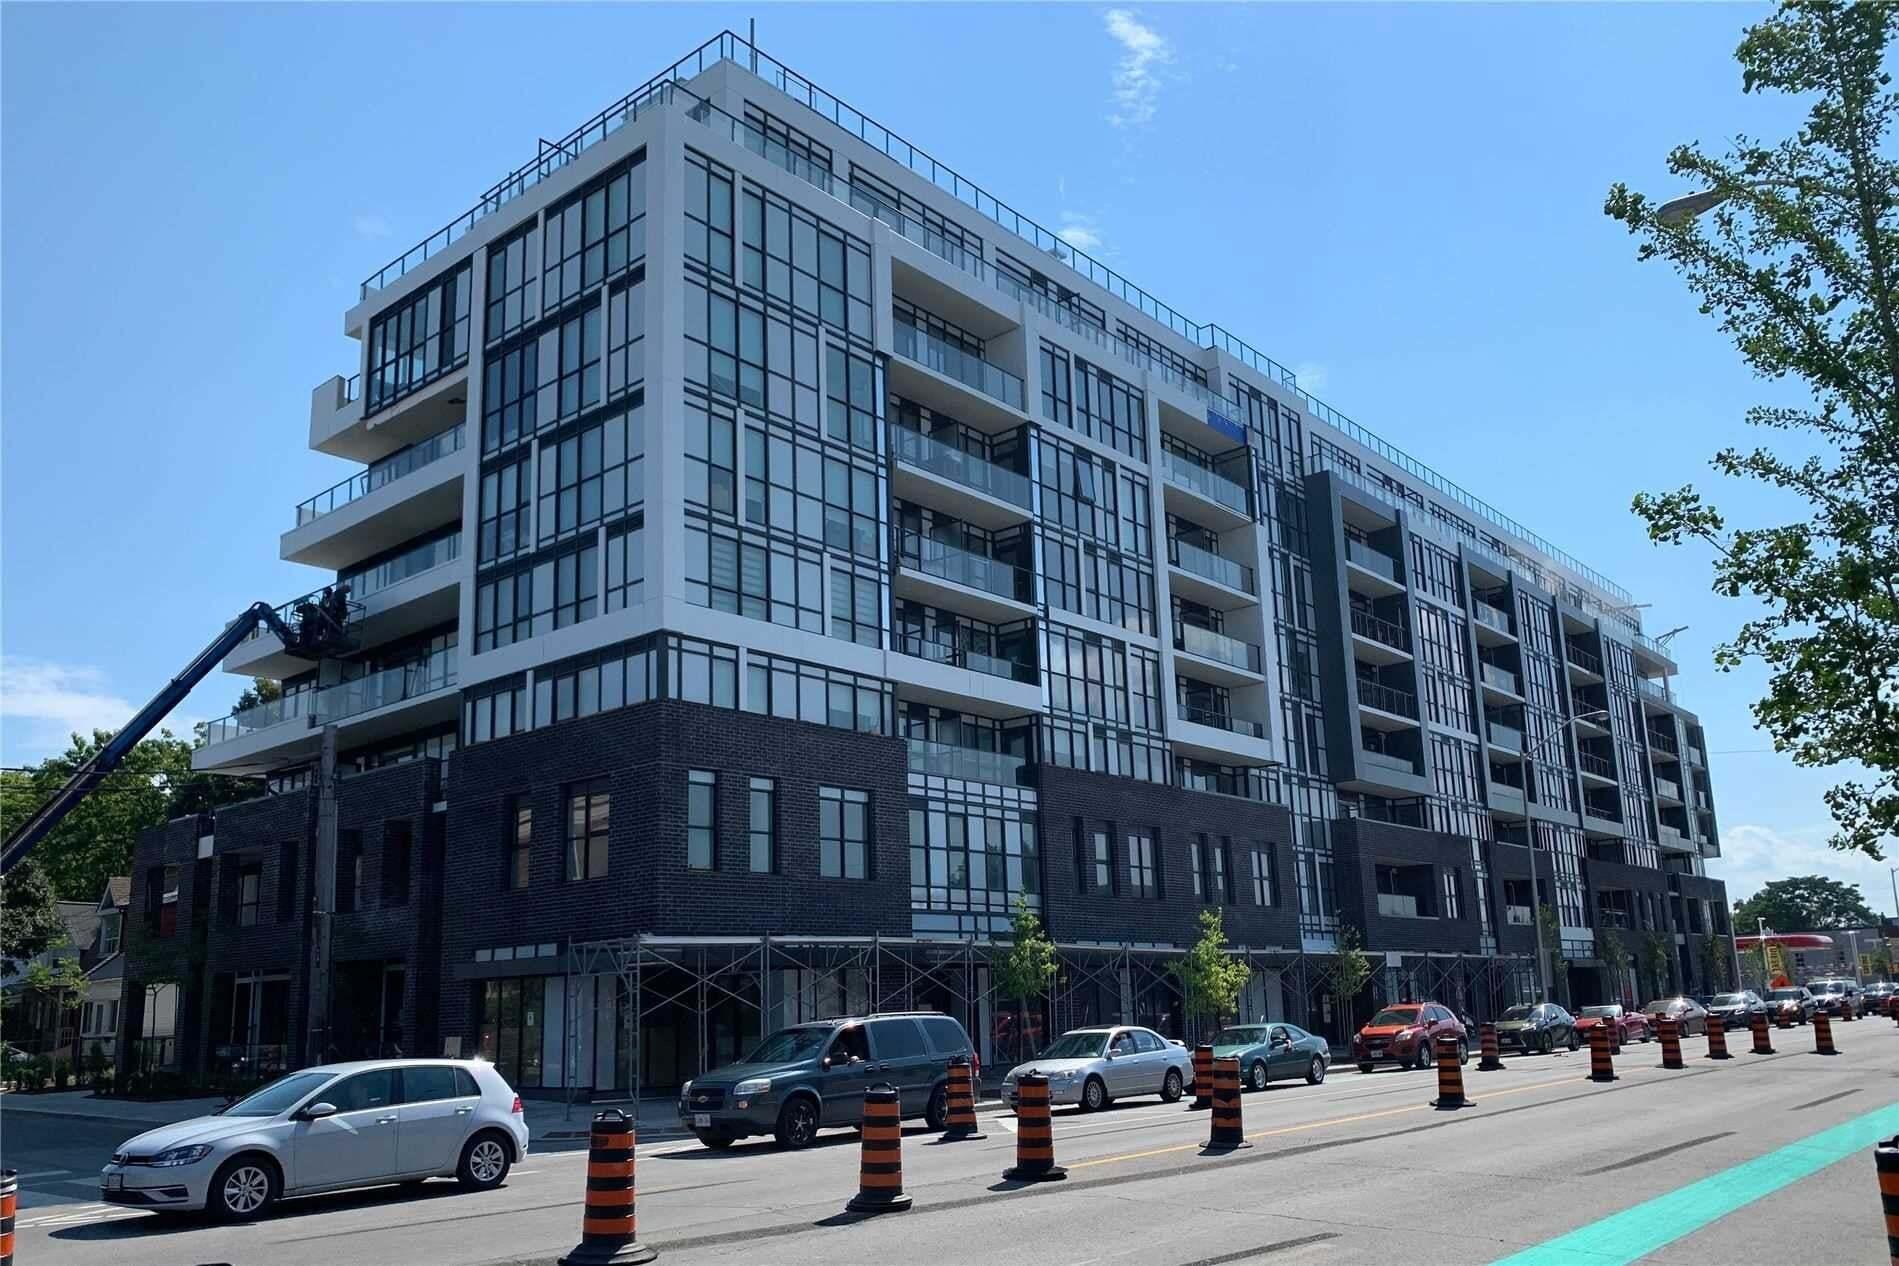 Buliding: 2301 Danforth Avenue, Toronto, ON